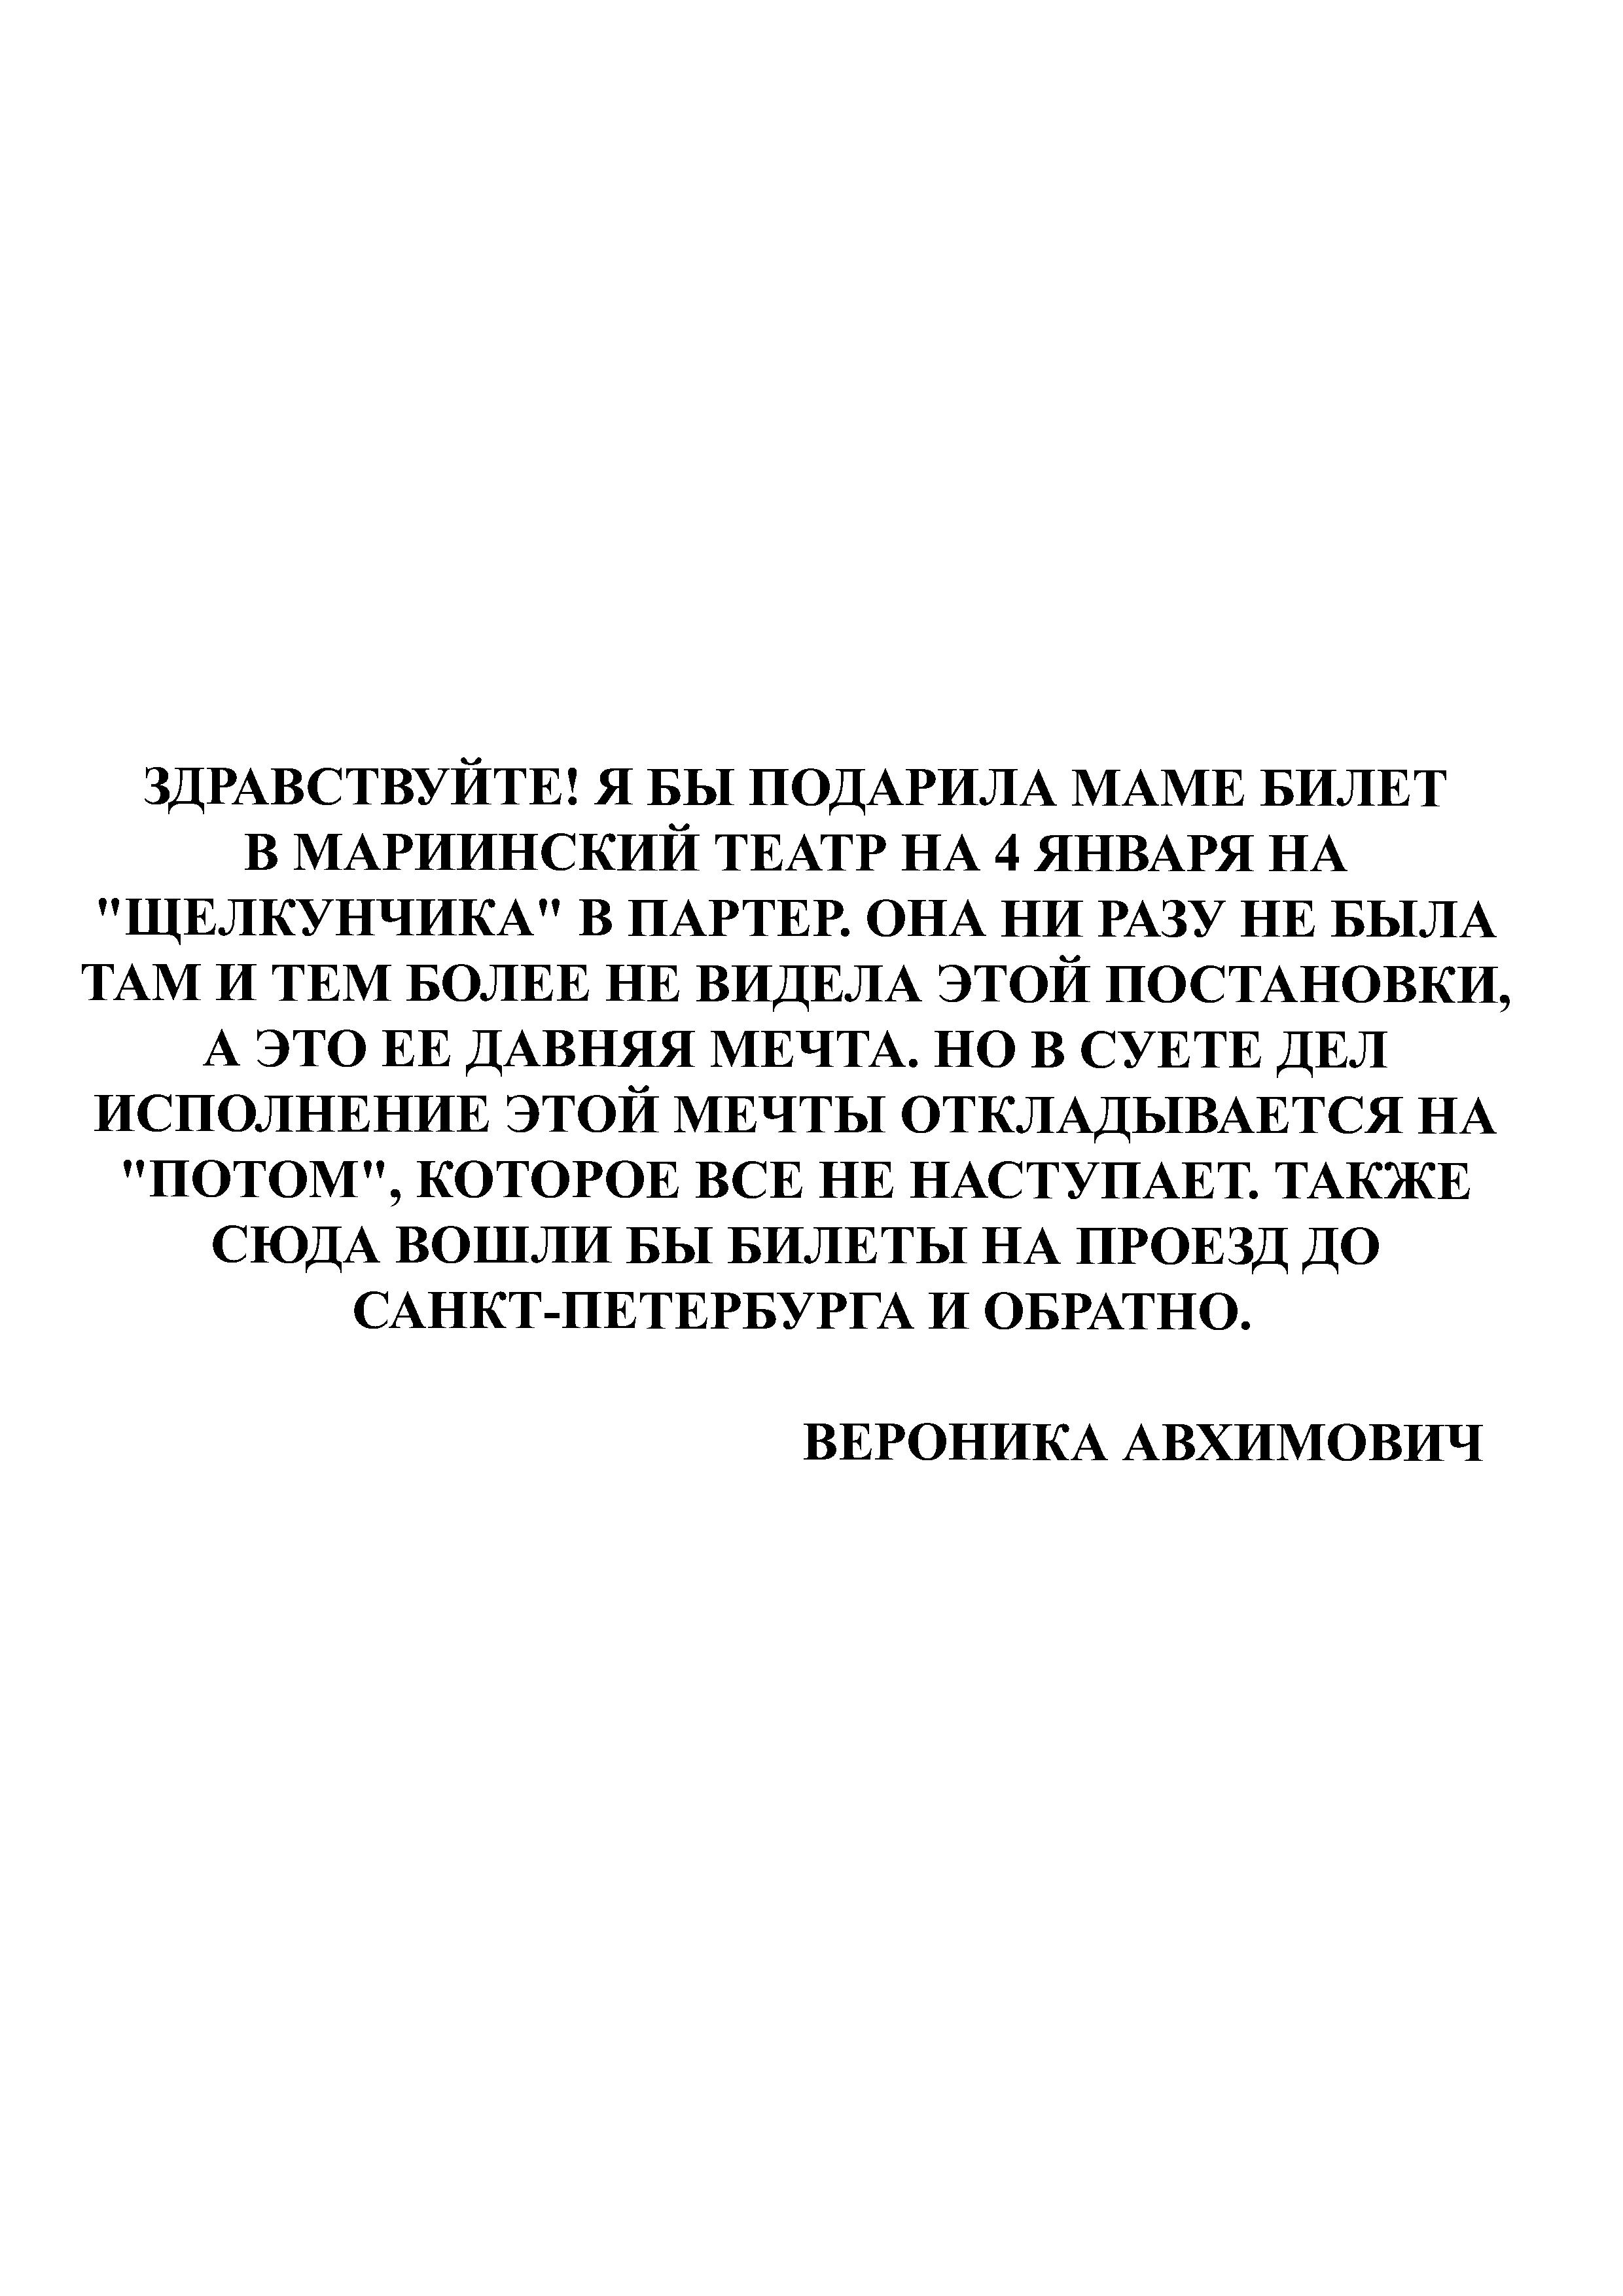 Вероника Авхимович